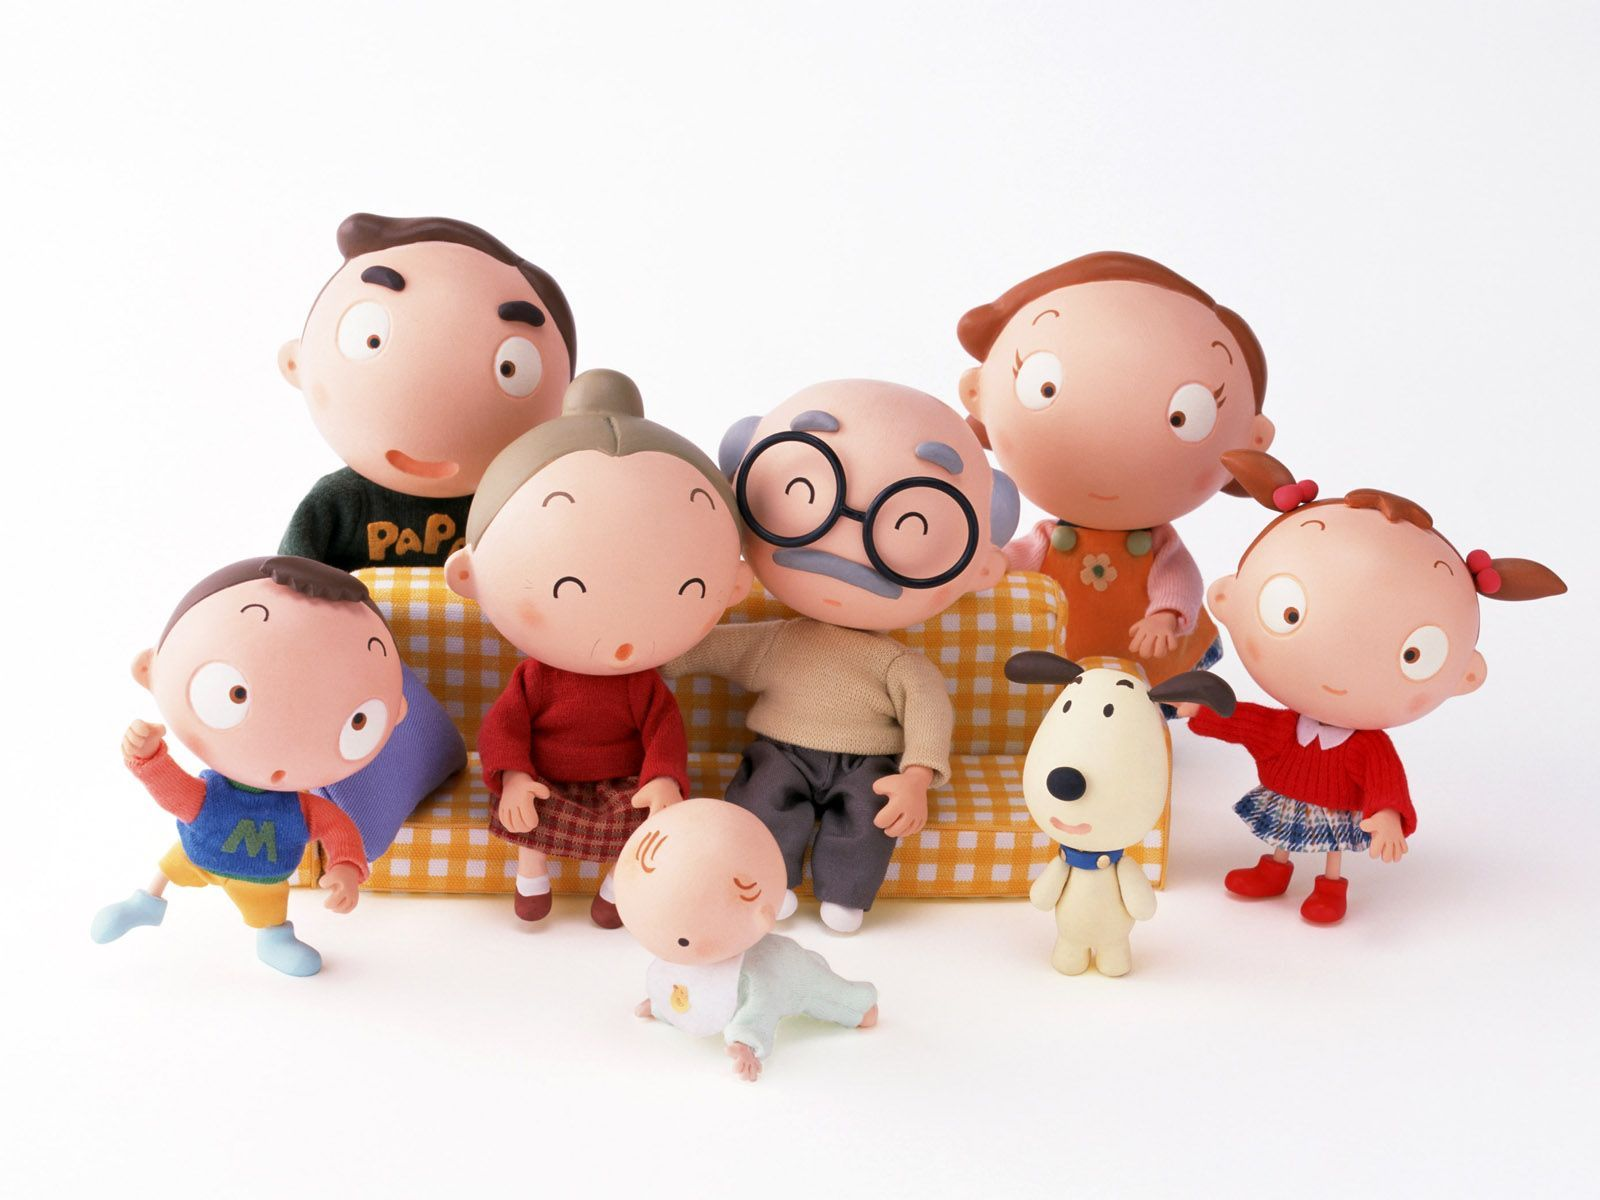 Cartoon Family Wallpapers Top Free Cartoon Family Backgrounds Wallpaperaccess